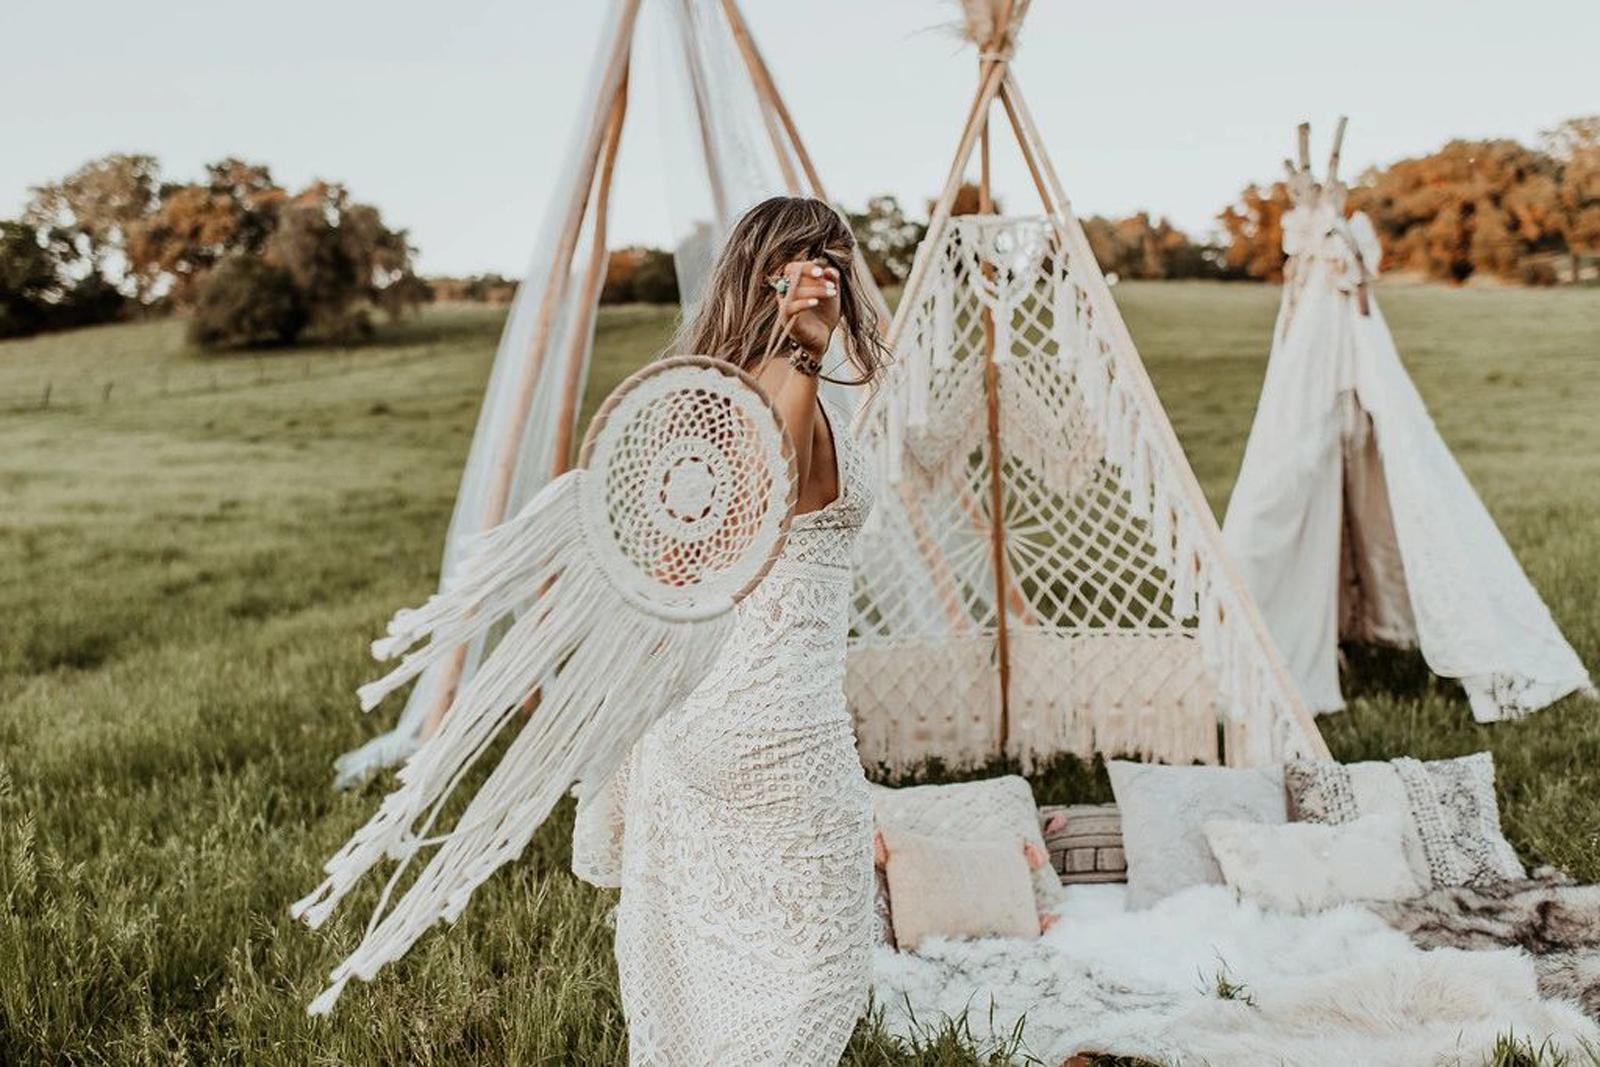 Best Sacramento Wedding Rentals | Best Tahoe Wedding Rentals | Best Northern California Wedding Rentals | Best Sacramento Wedding Decor | Best Tahoe Wedding Decor | Best Northern California Wedding Decor